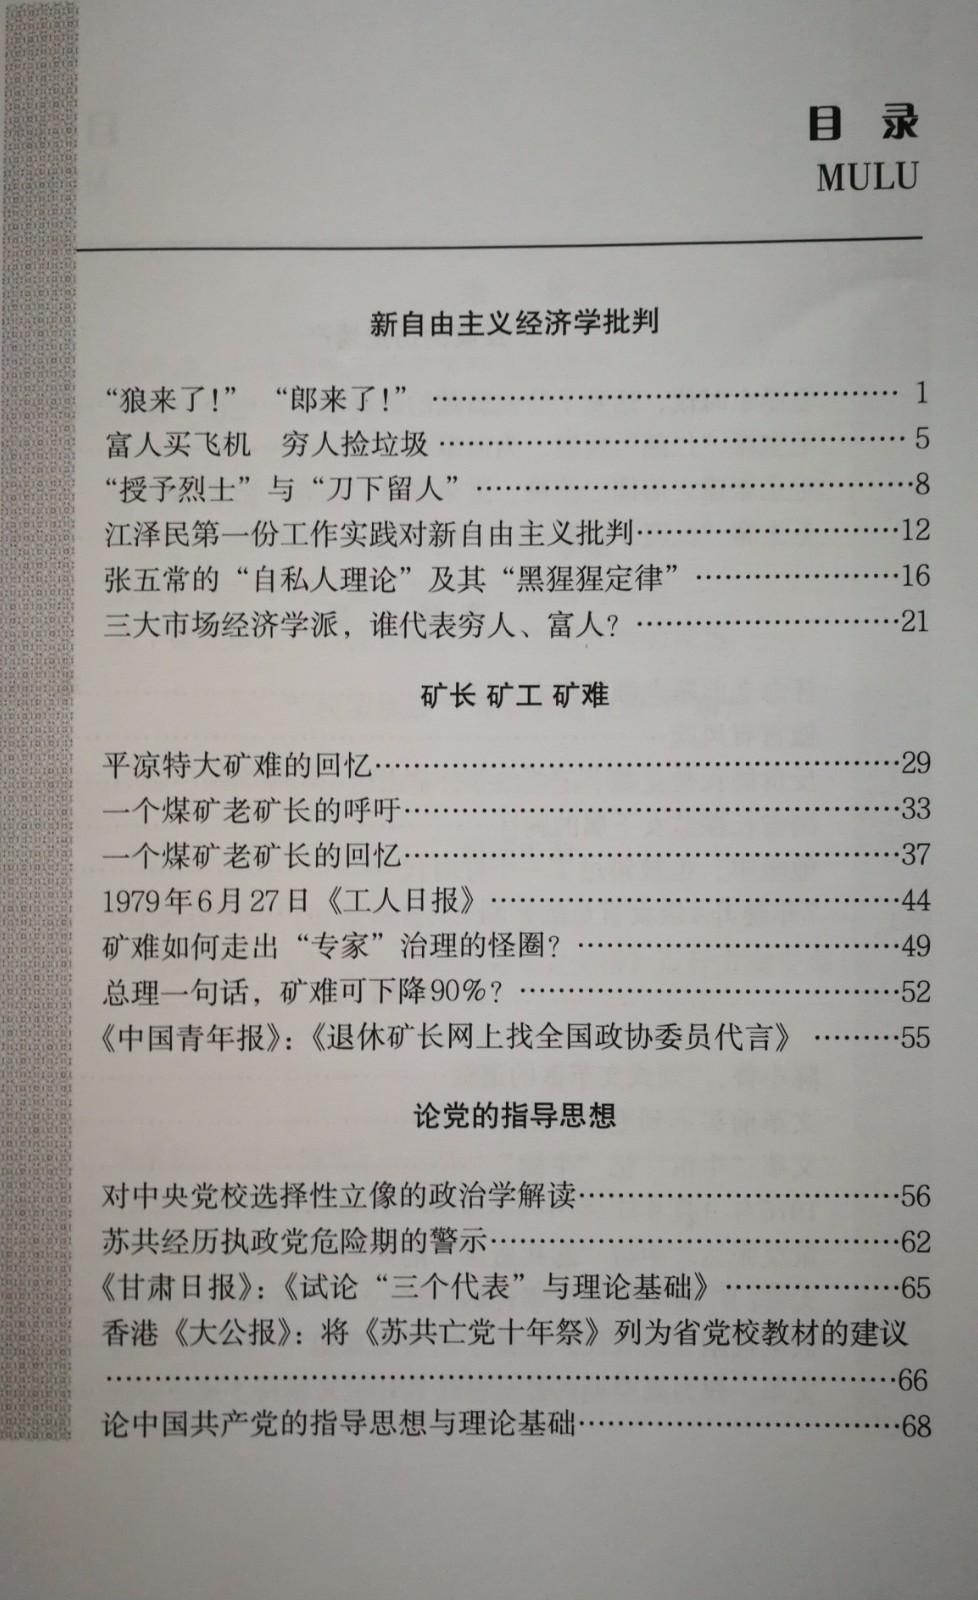 IMG_20180611_094918_看图王.jpg